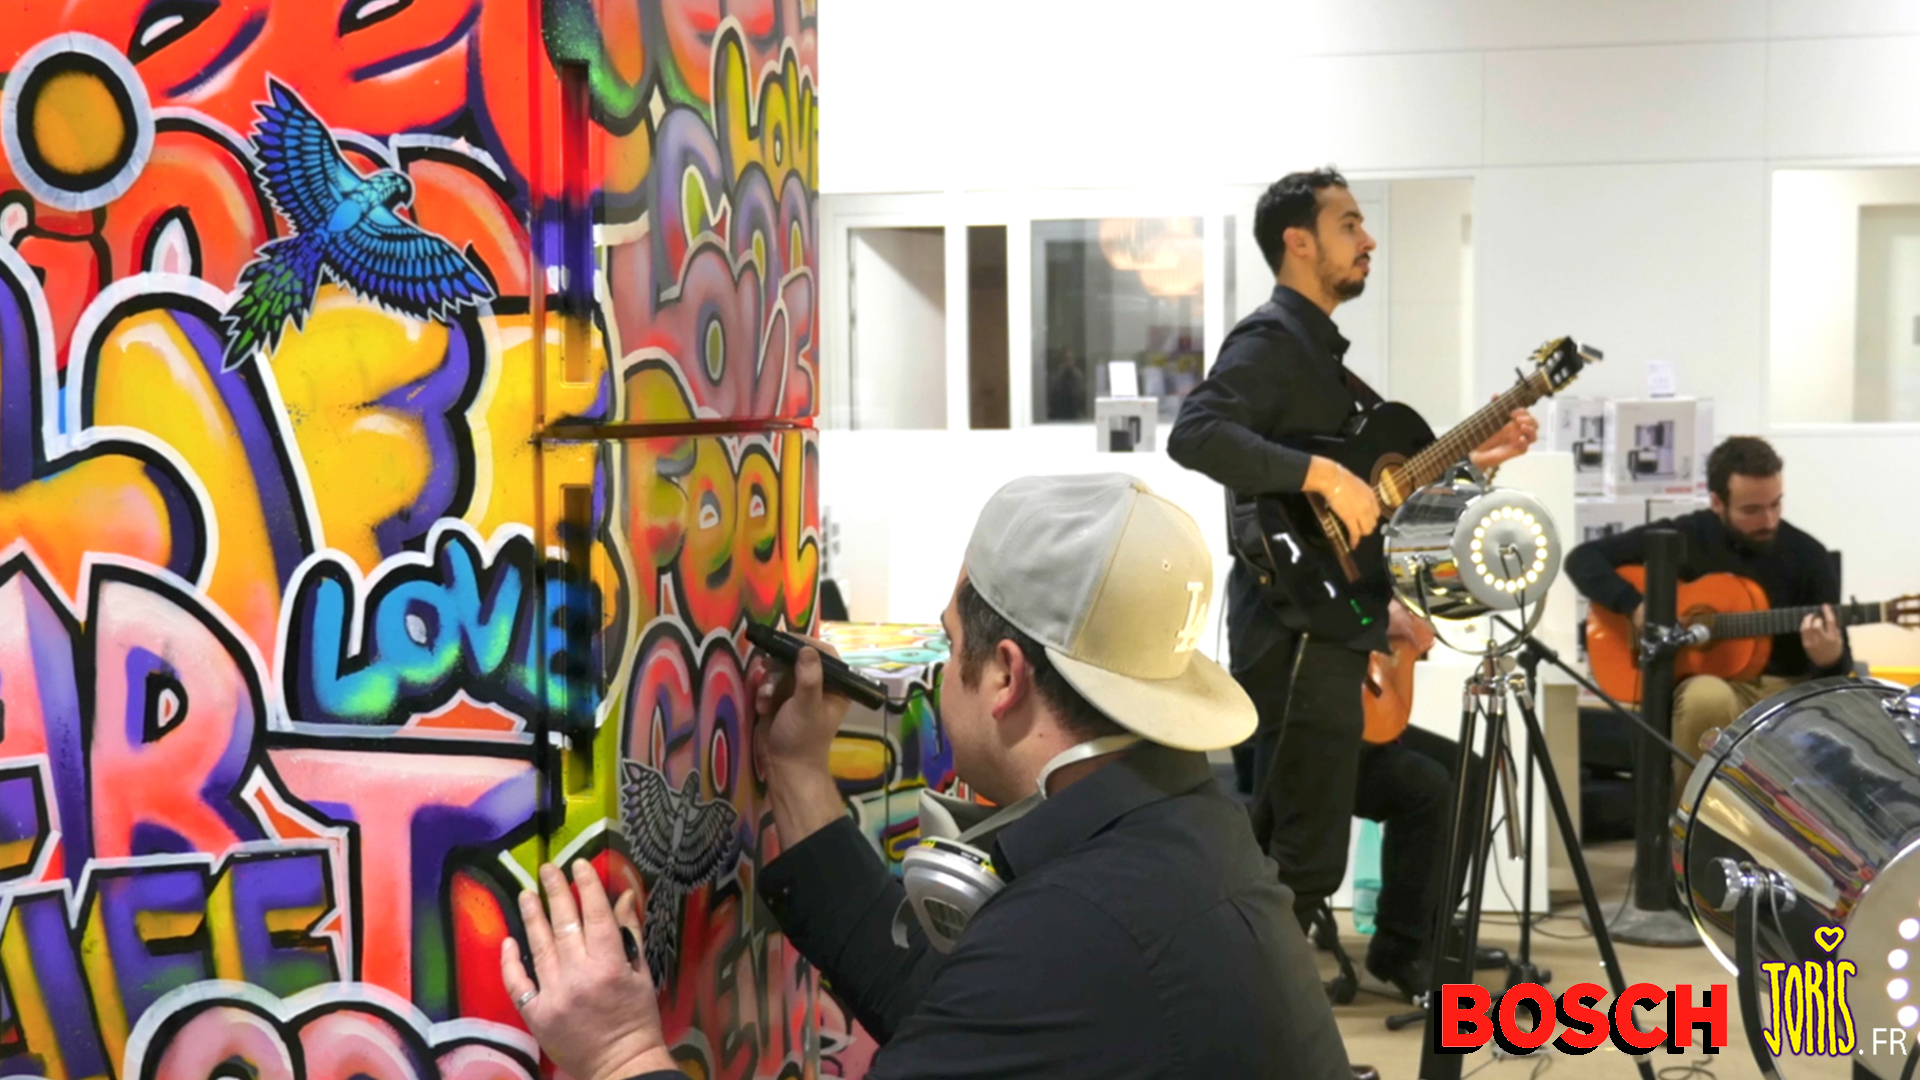 DECORATION-GRAFFITI-FRESQUE-TABLEAU-STREET-ART-PARIS-14